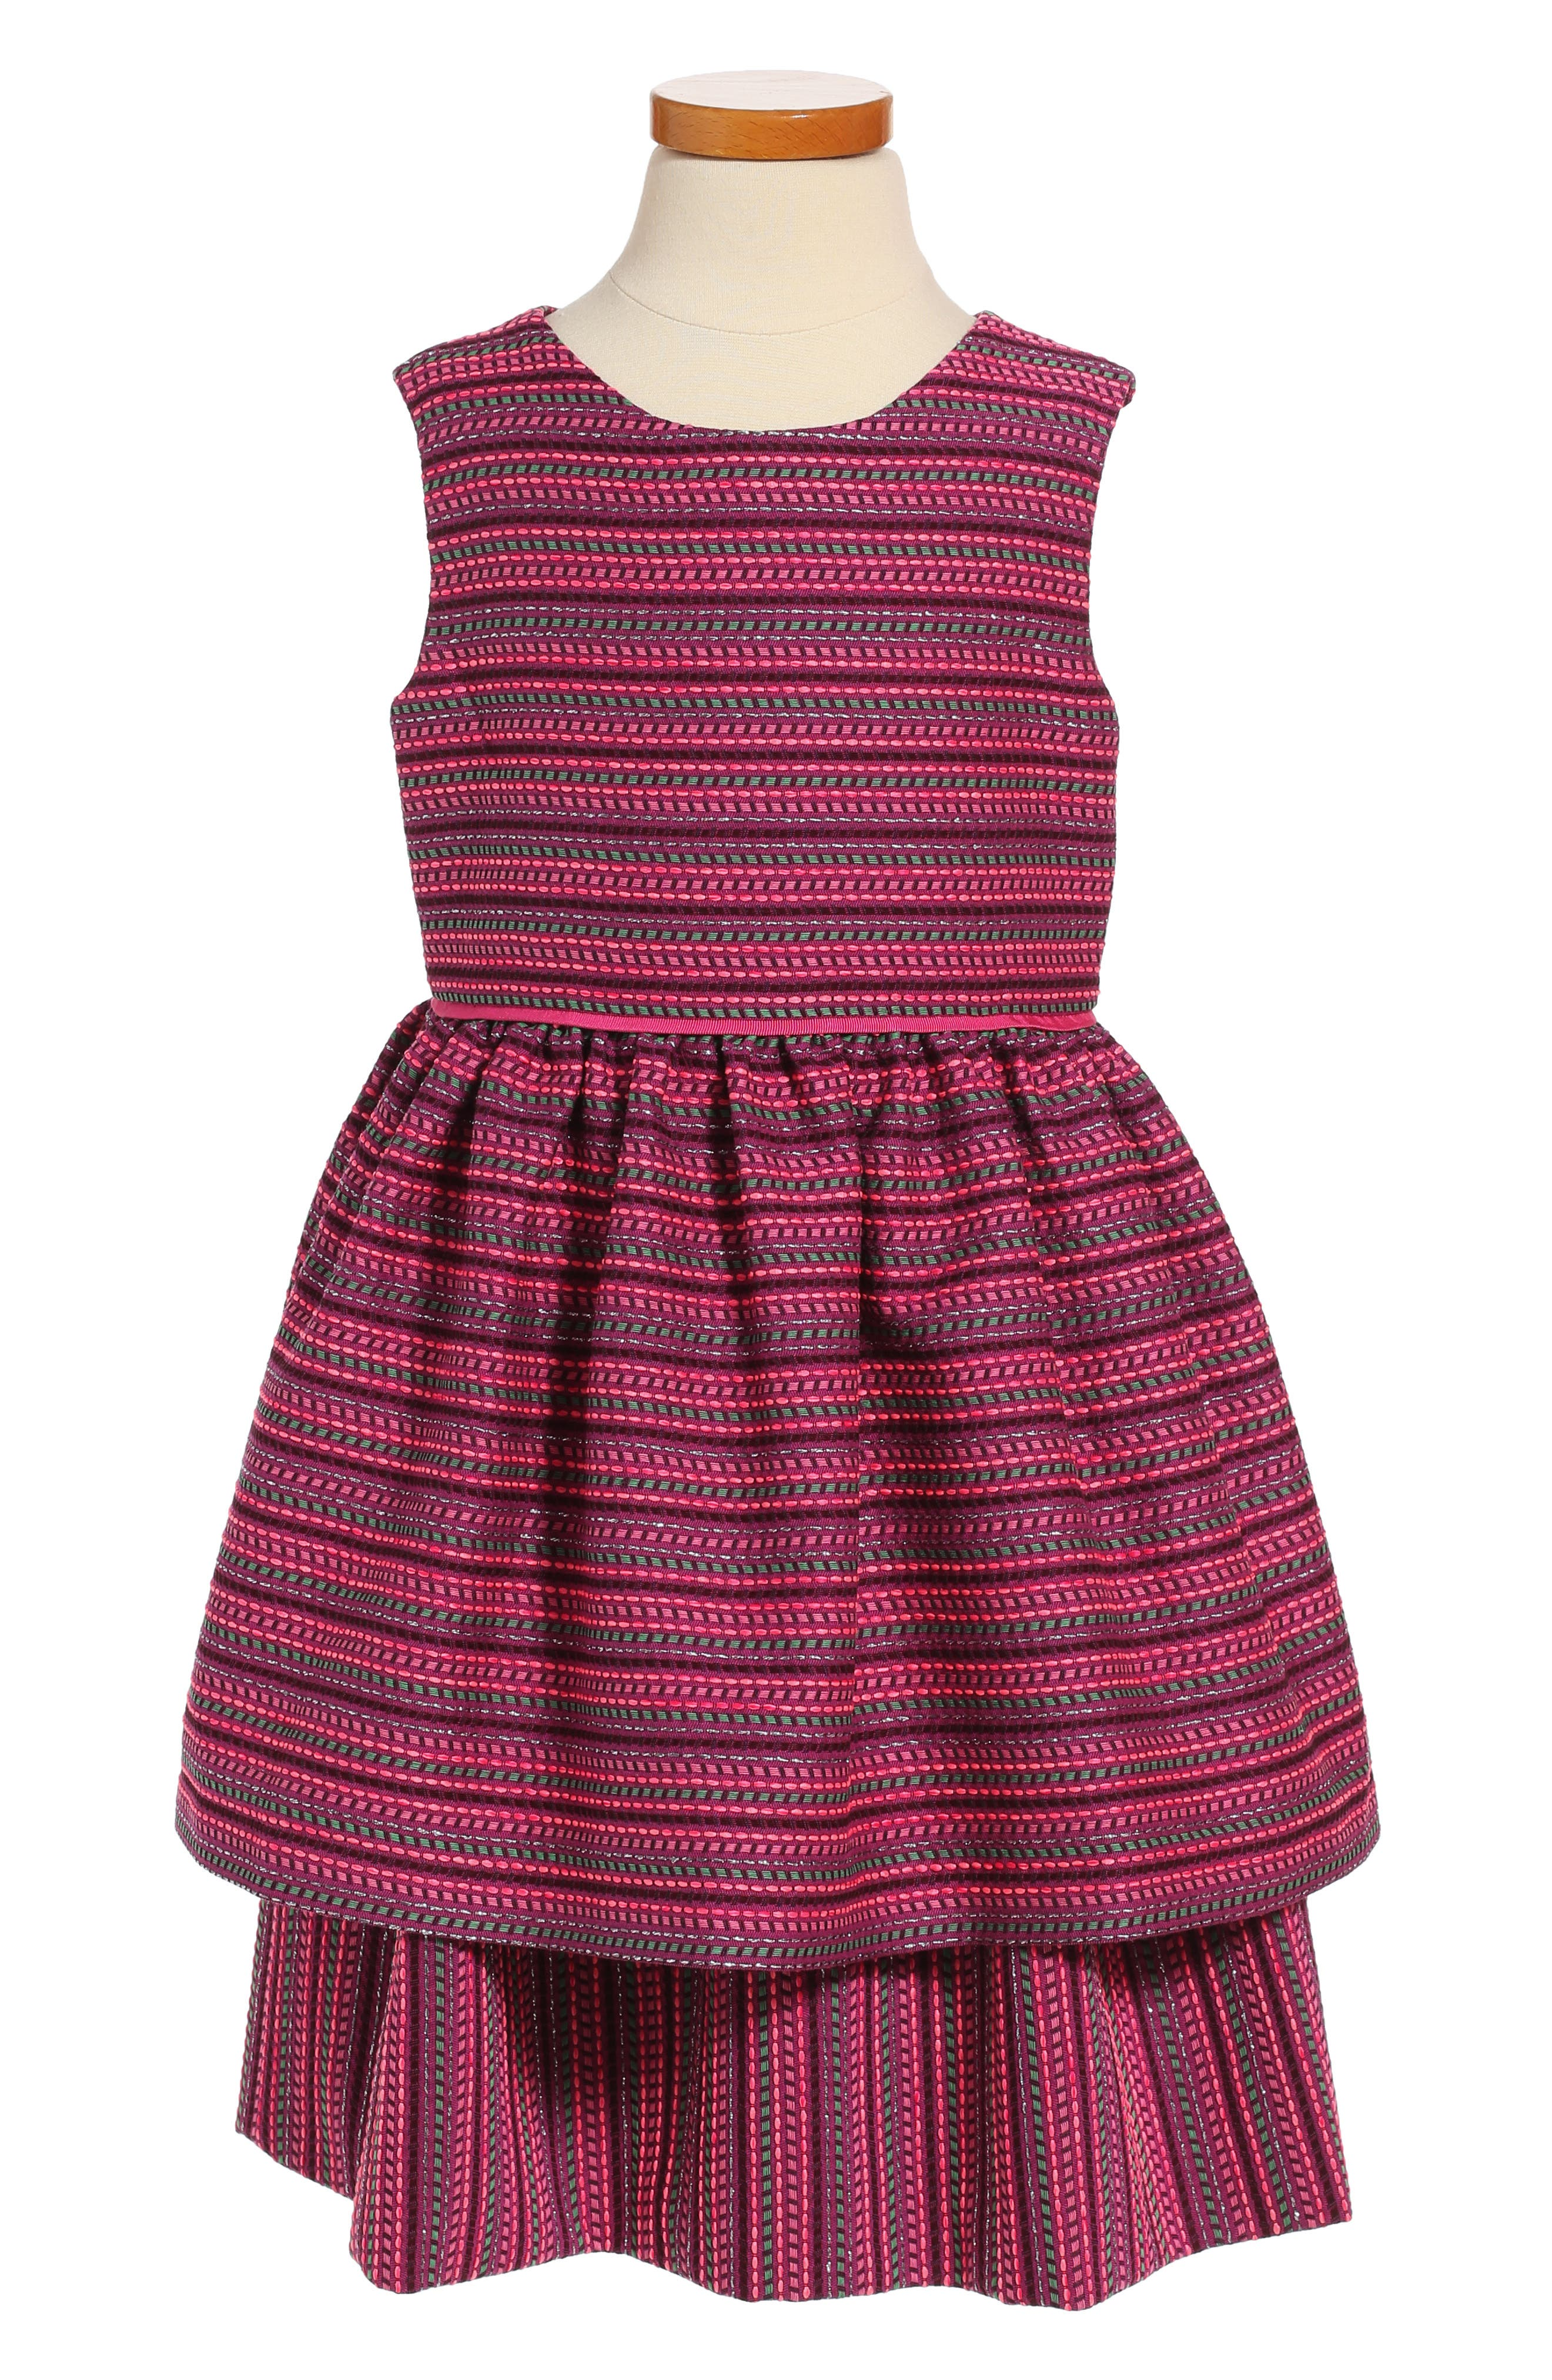 Tiered Sleeveless Dress,                             Main thumbnail 1, color,